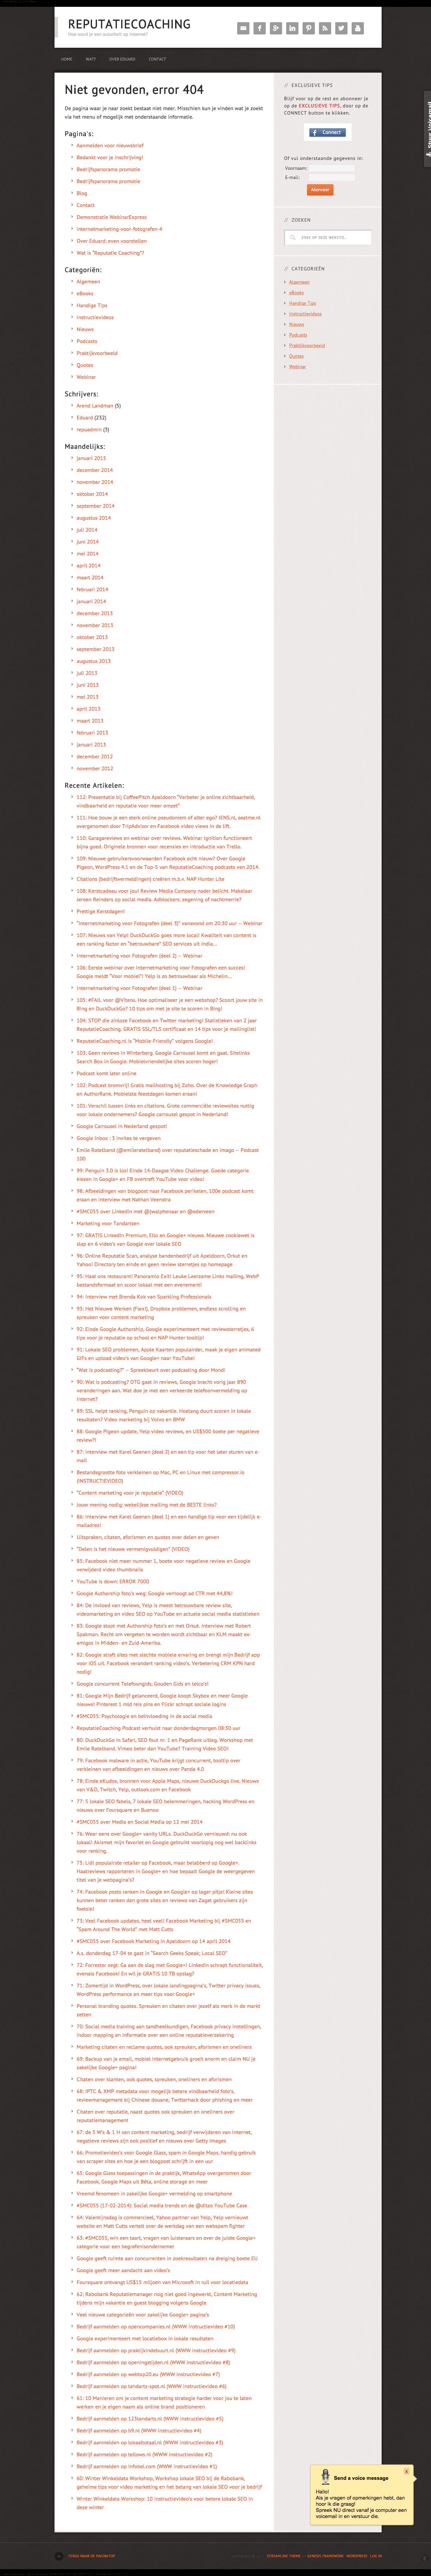 Pagina-niet-gevonden-ReputatieCoaching